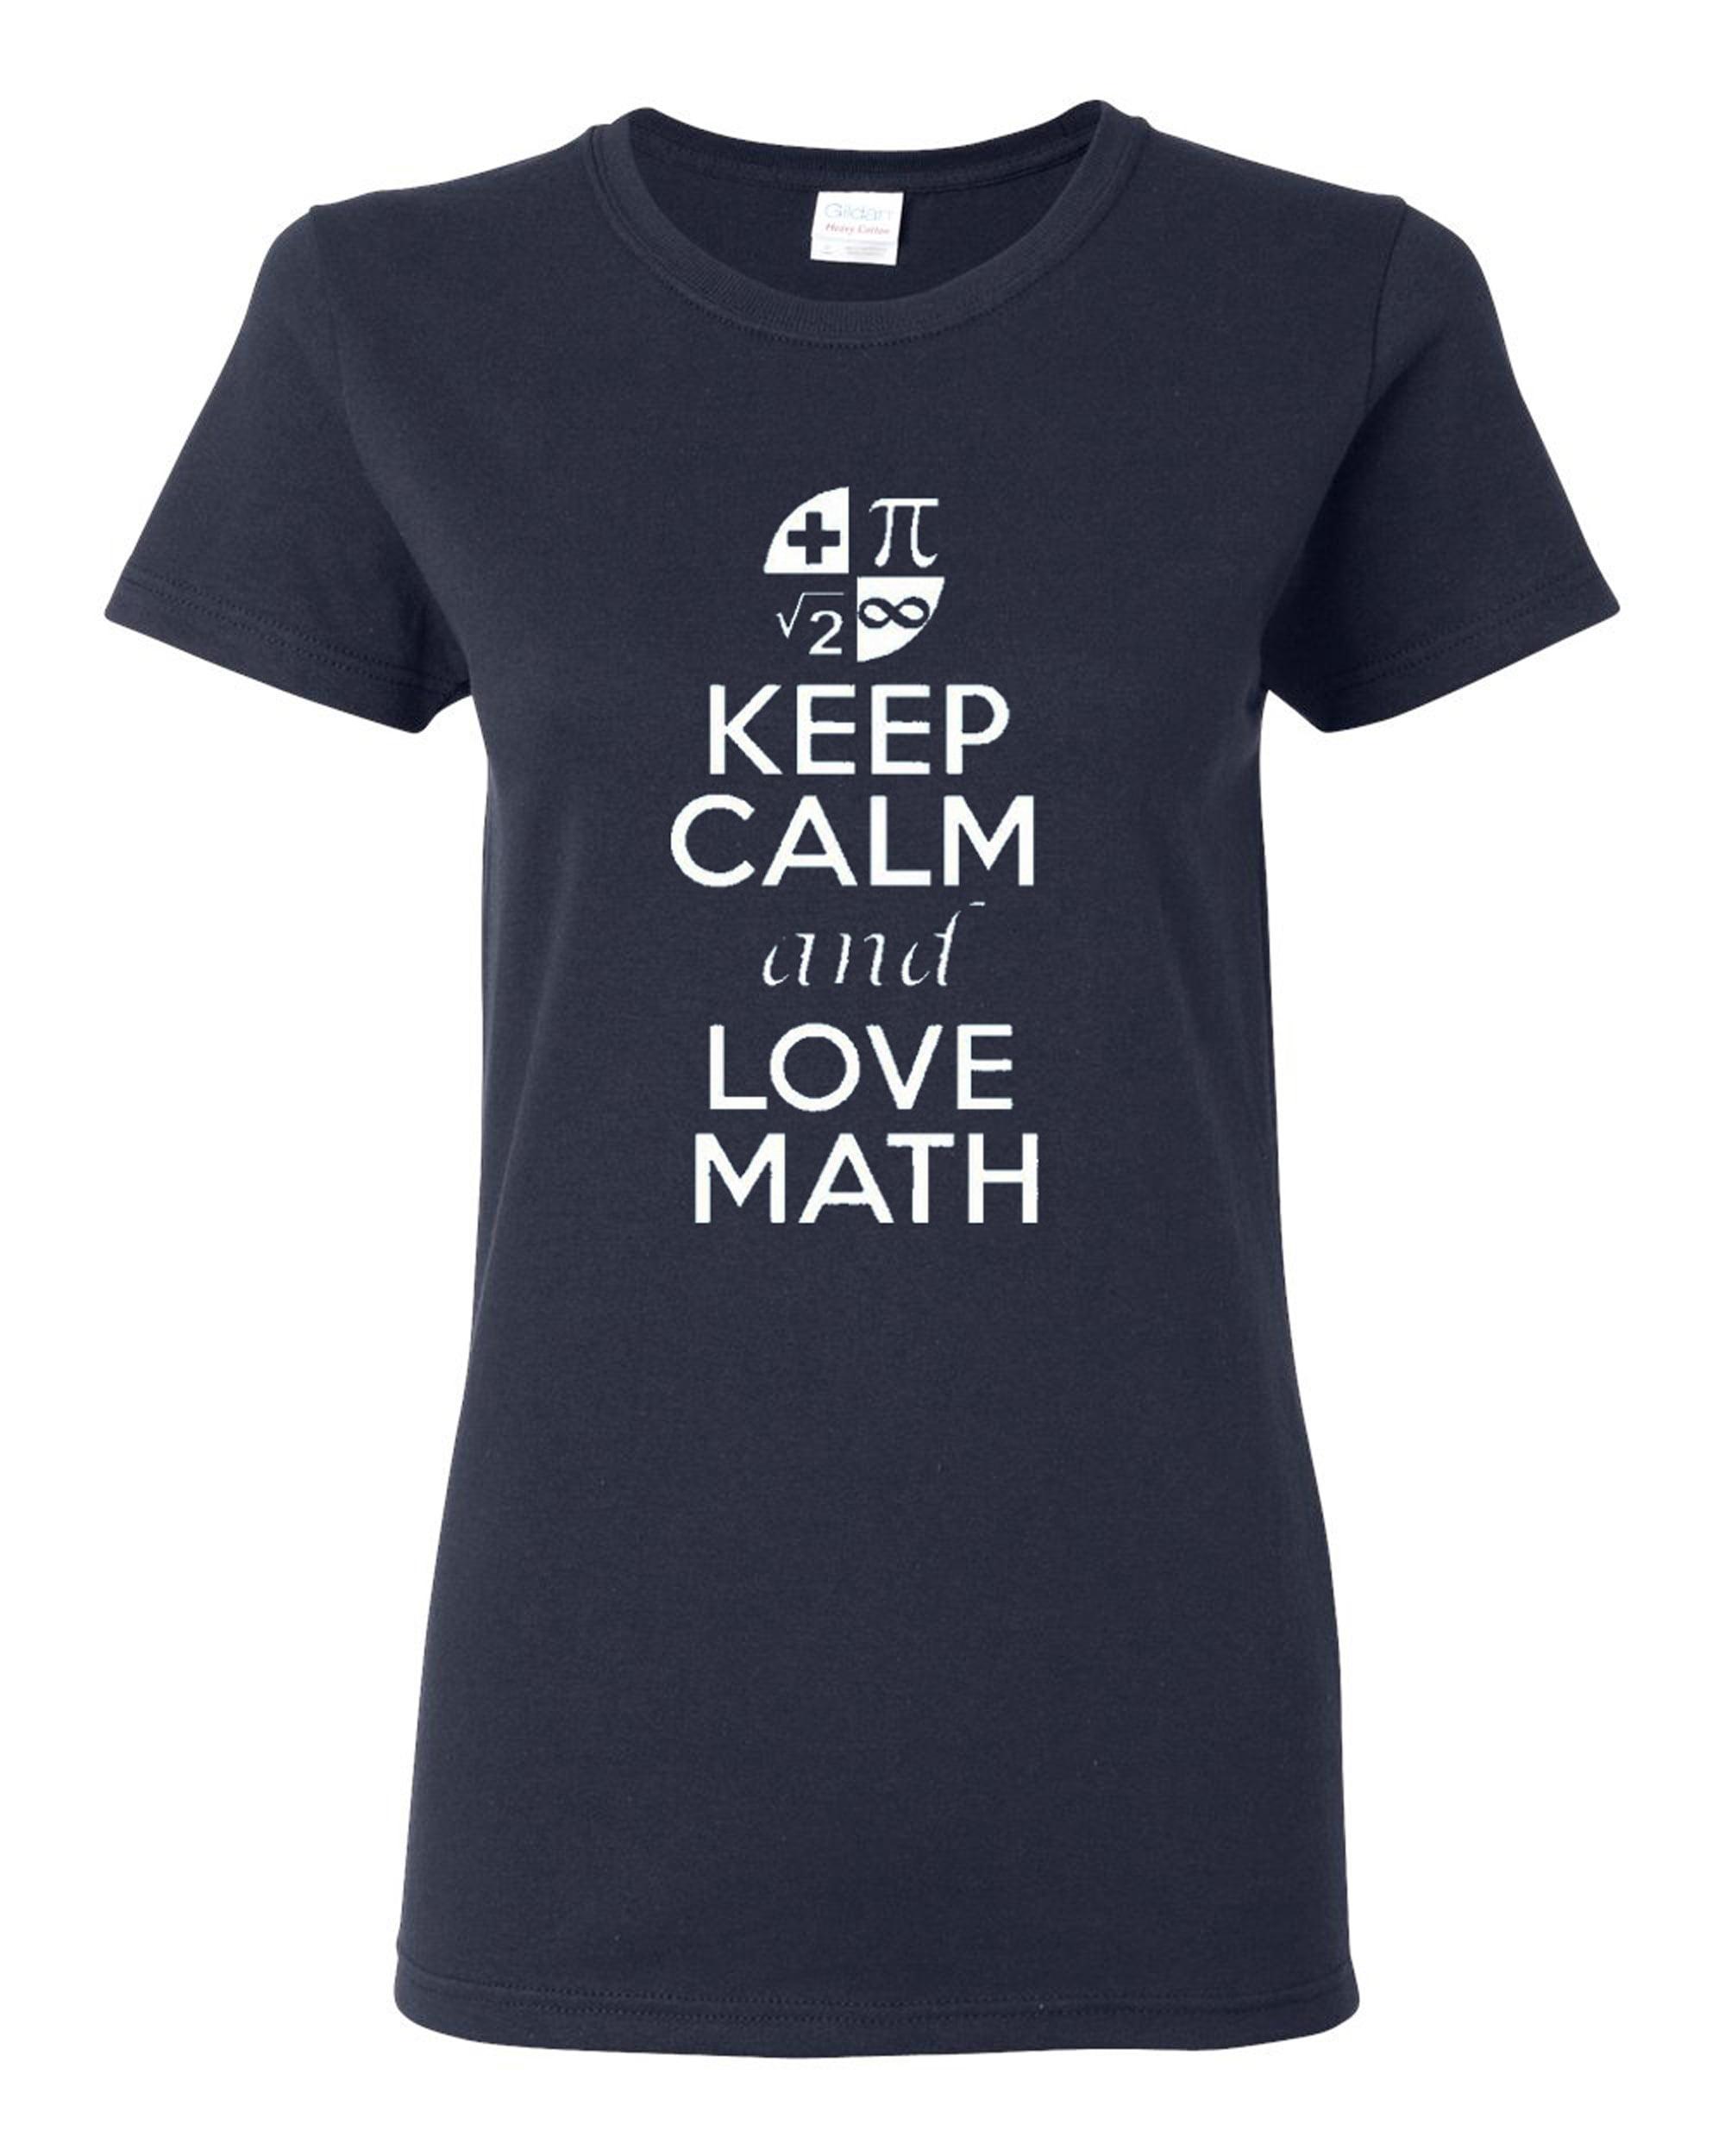 ladies new keep calm and love math t-shirt tee - walmart